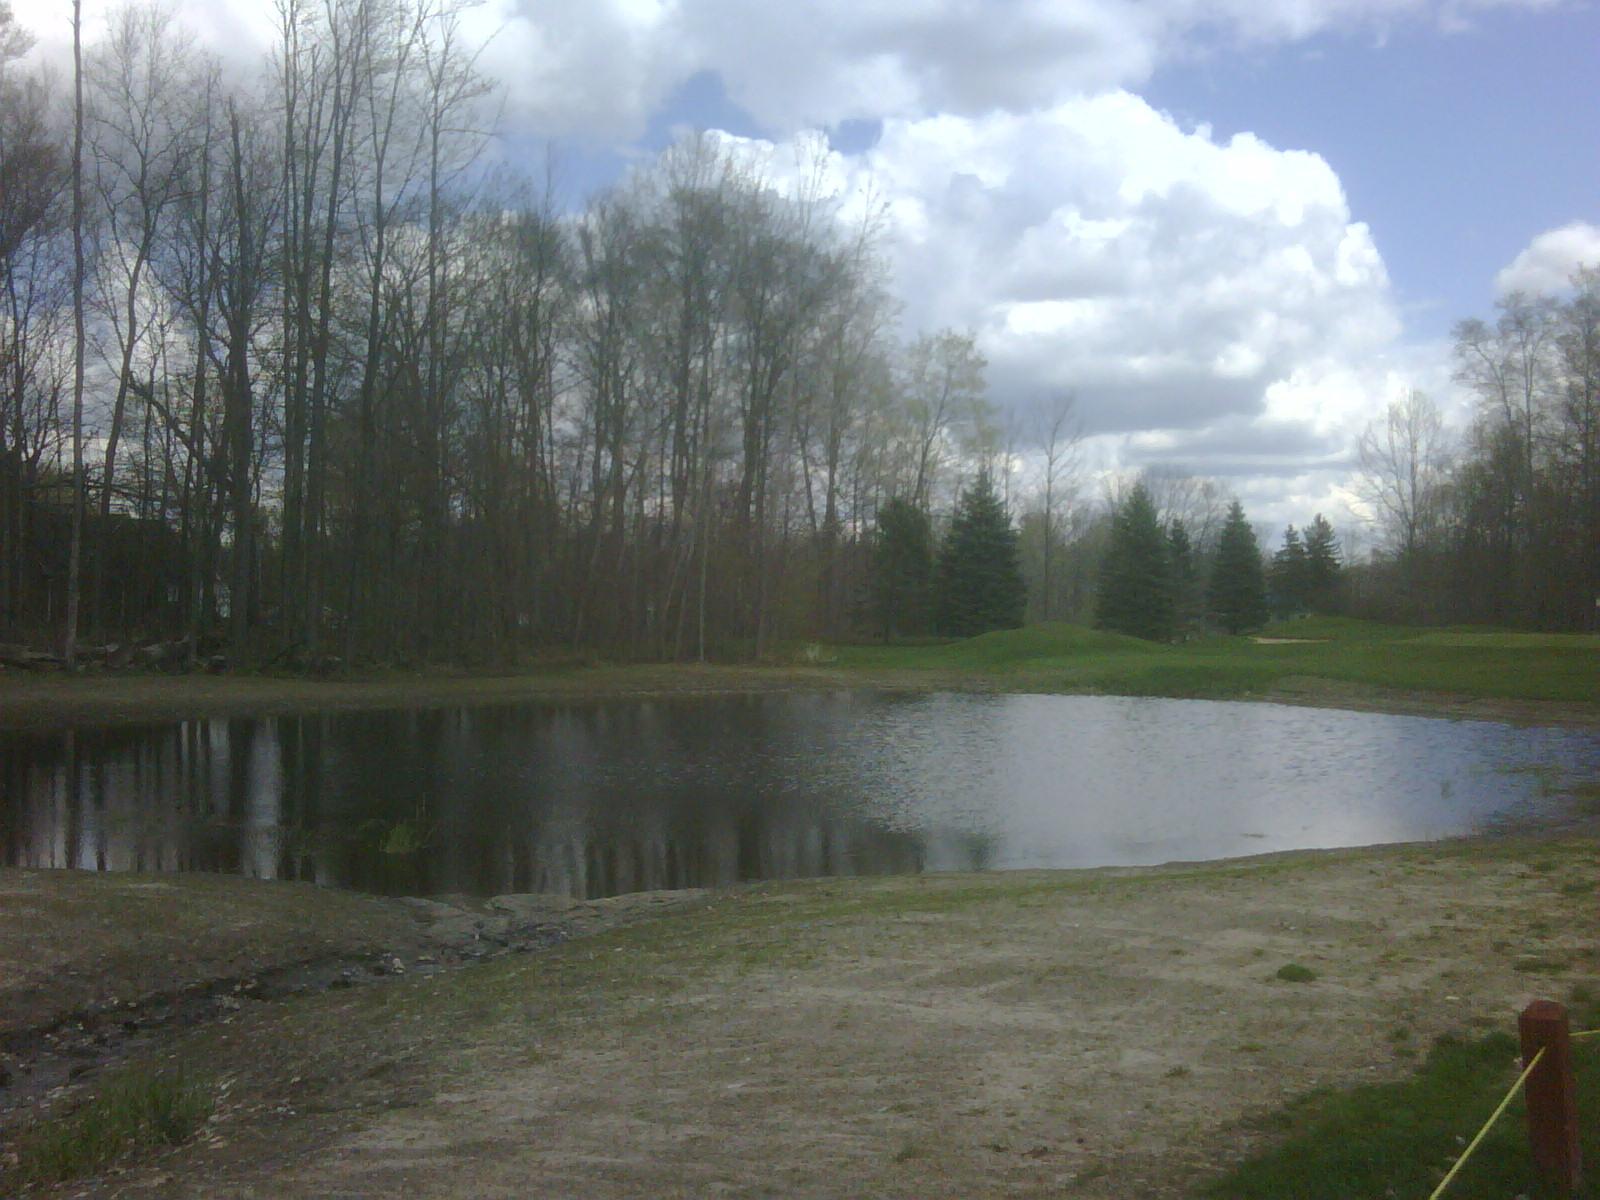 davison sugar bush golf course n (109).jpg